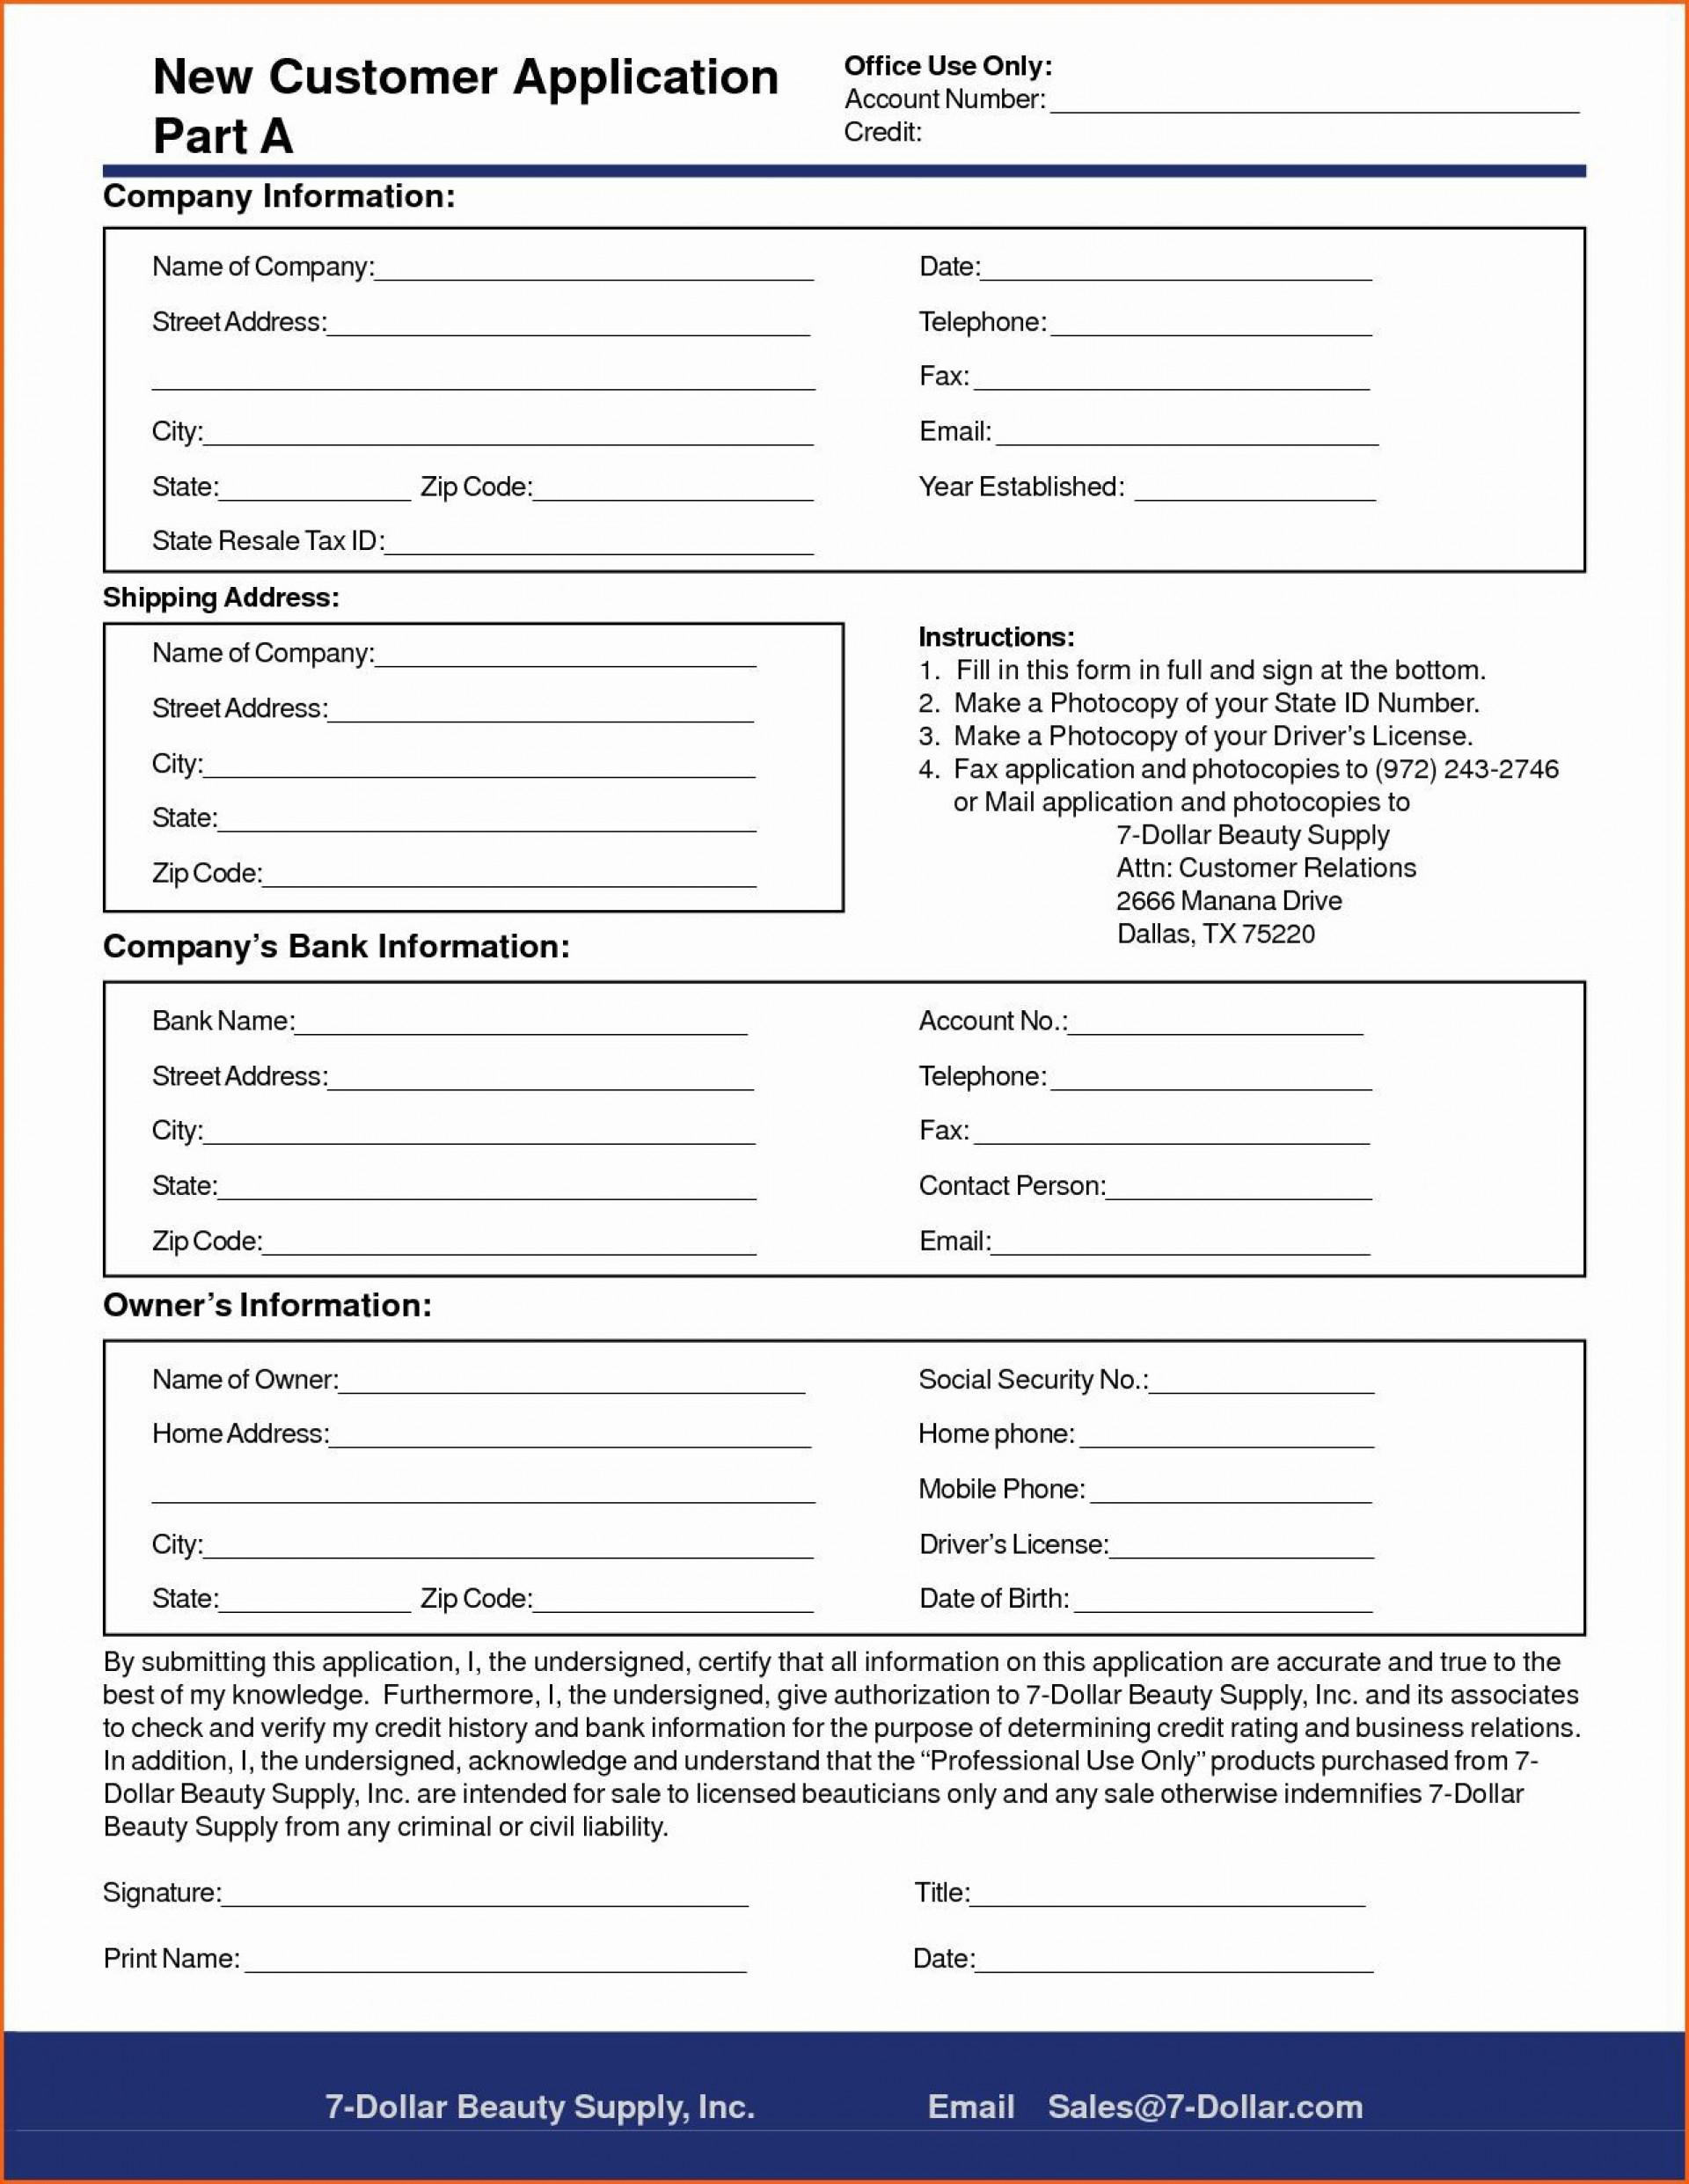 005 Rare New Customer Form Template Word Photo  Registration Account Feedback1920